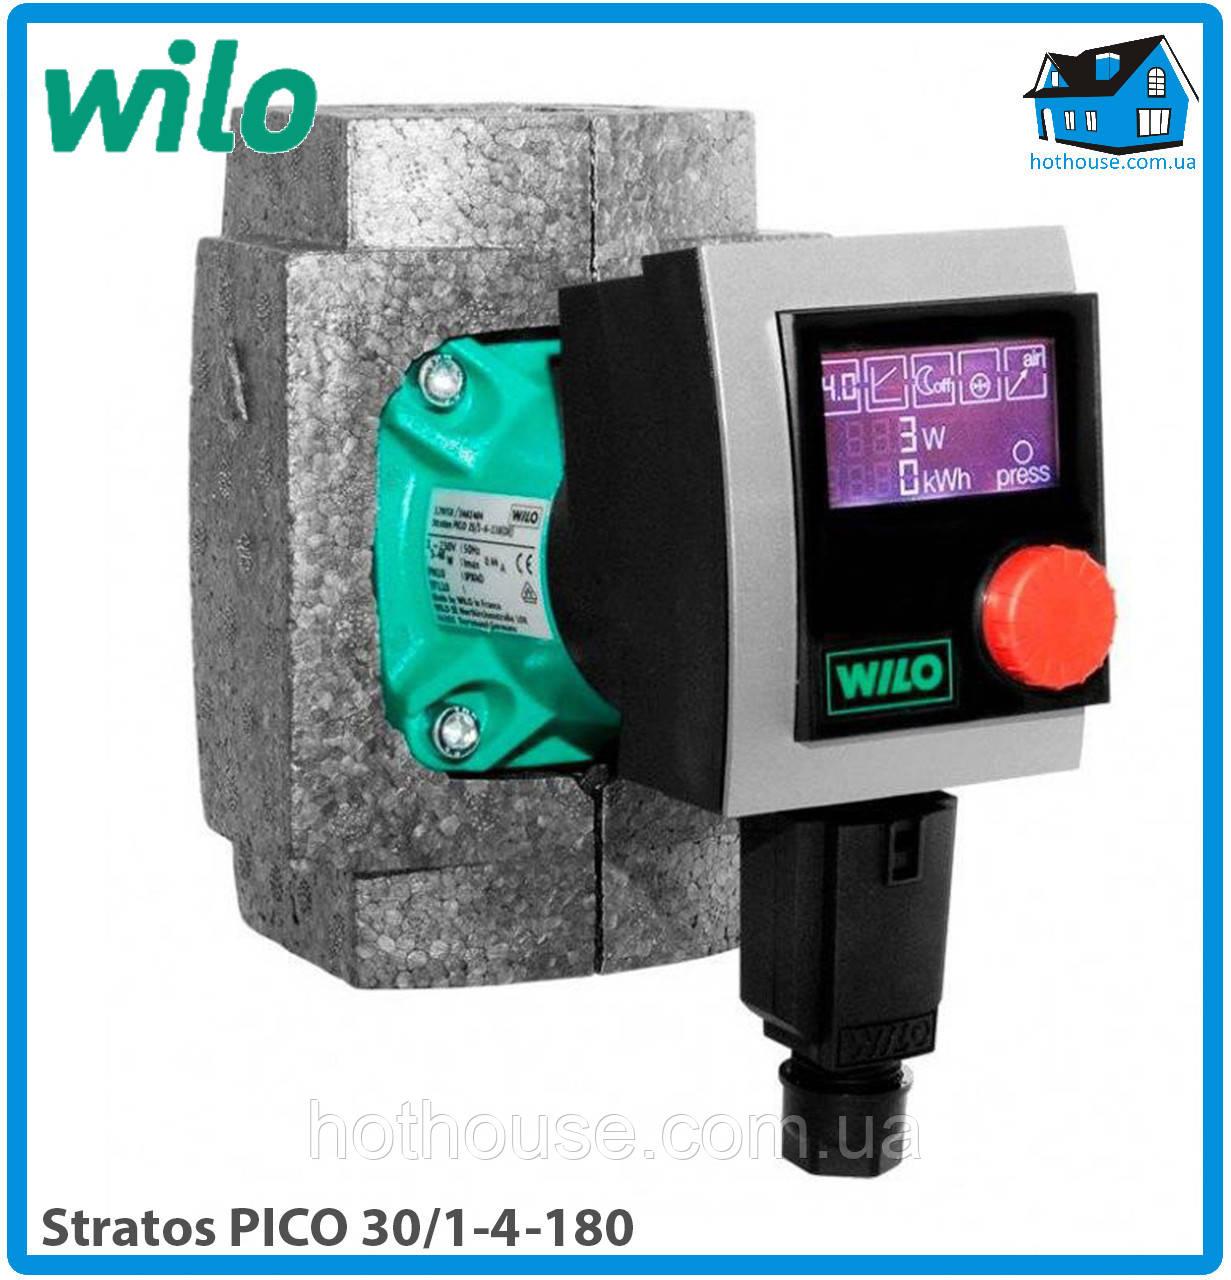 Насос циркуляционный Wilo Stratos PICO 30/1-4 (оригинал)